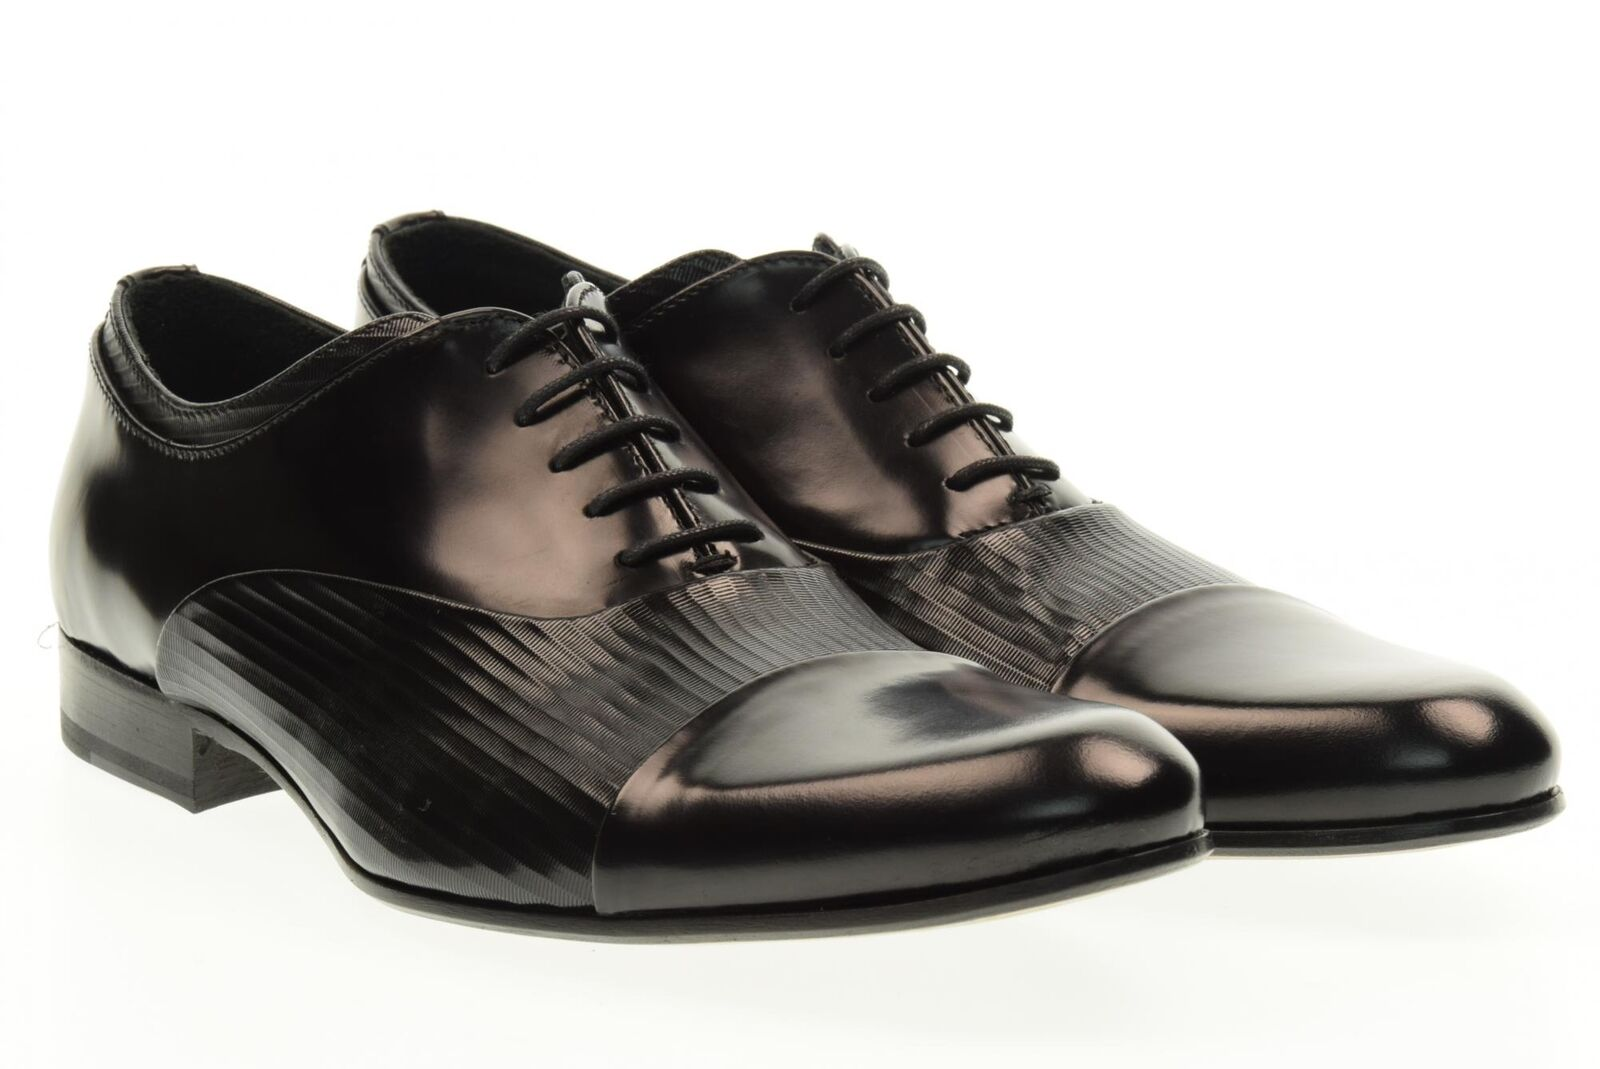 Eveet P17s zapatos de hombre de encaje-15910 P-REX LÍNEA